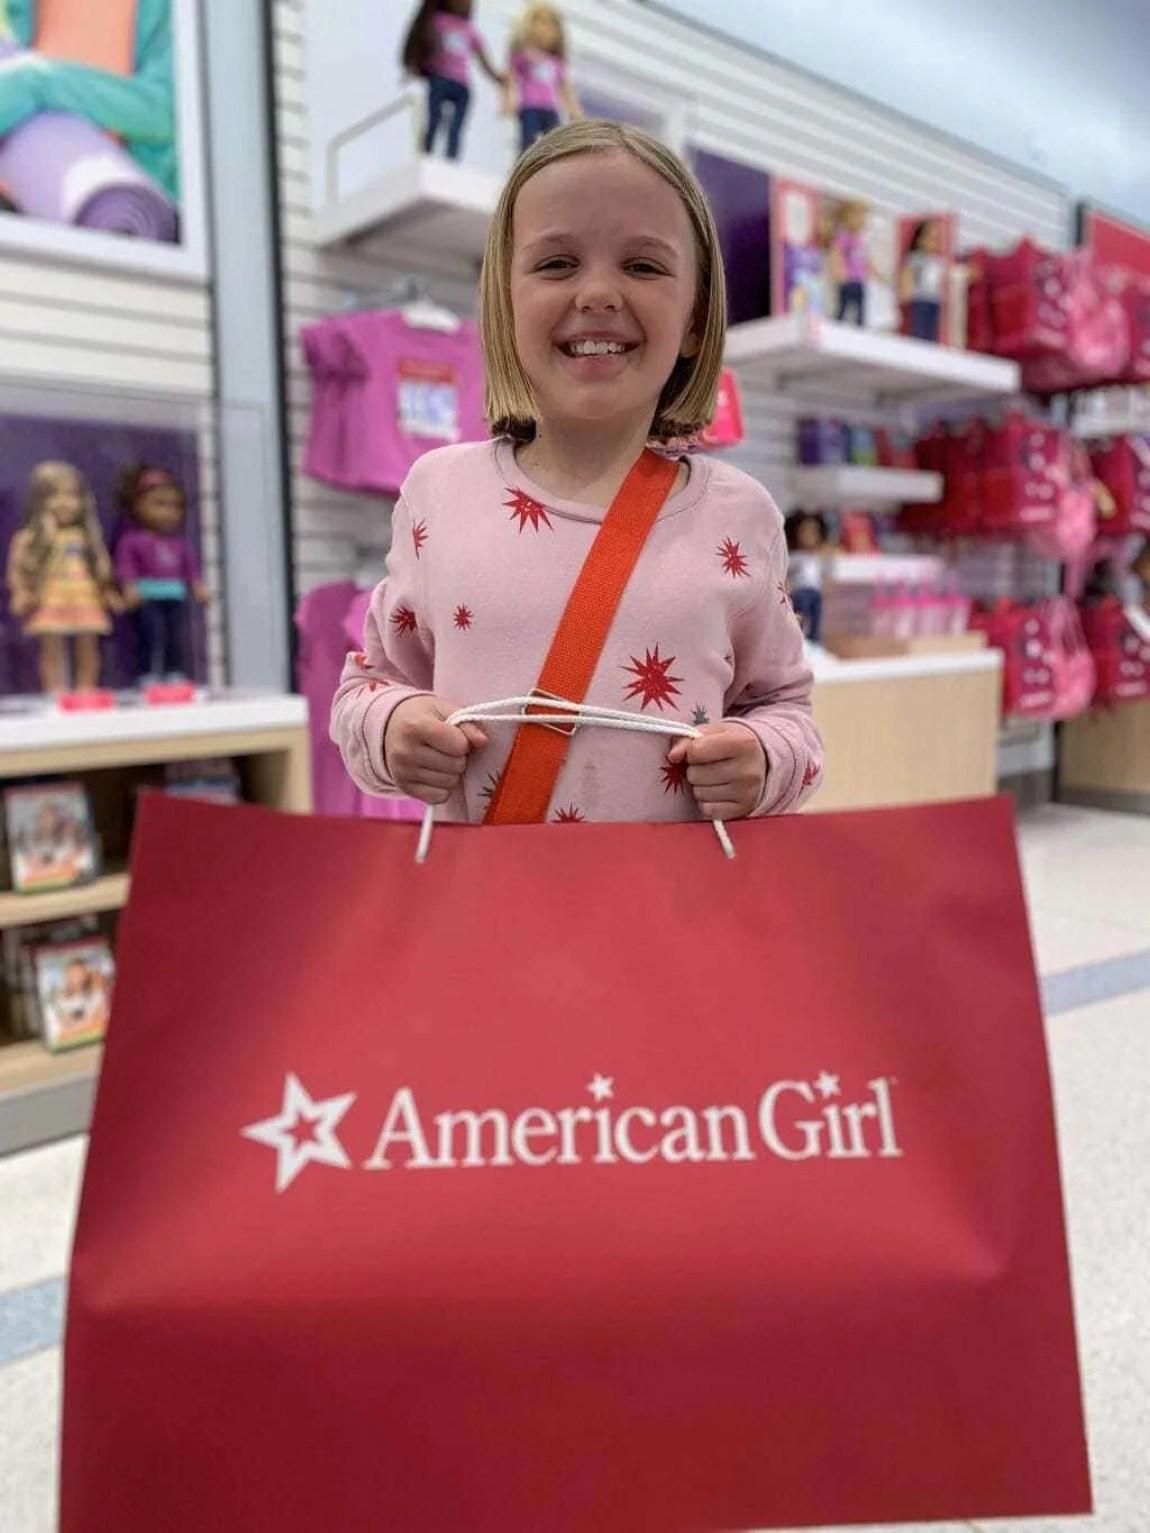 American Girl Doll purchase